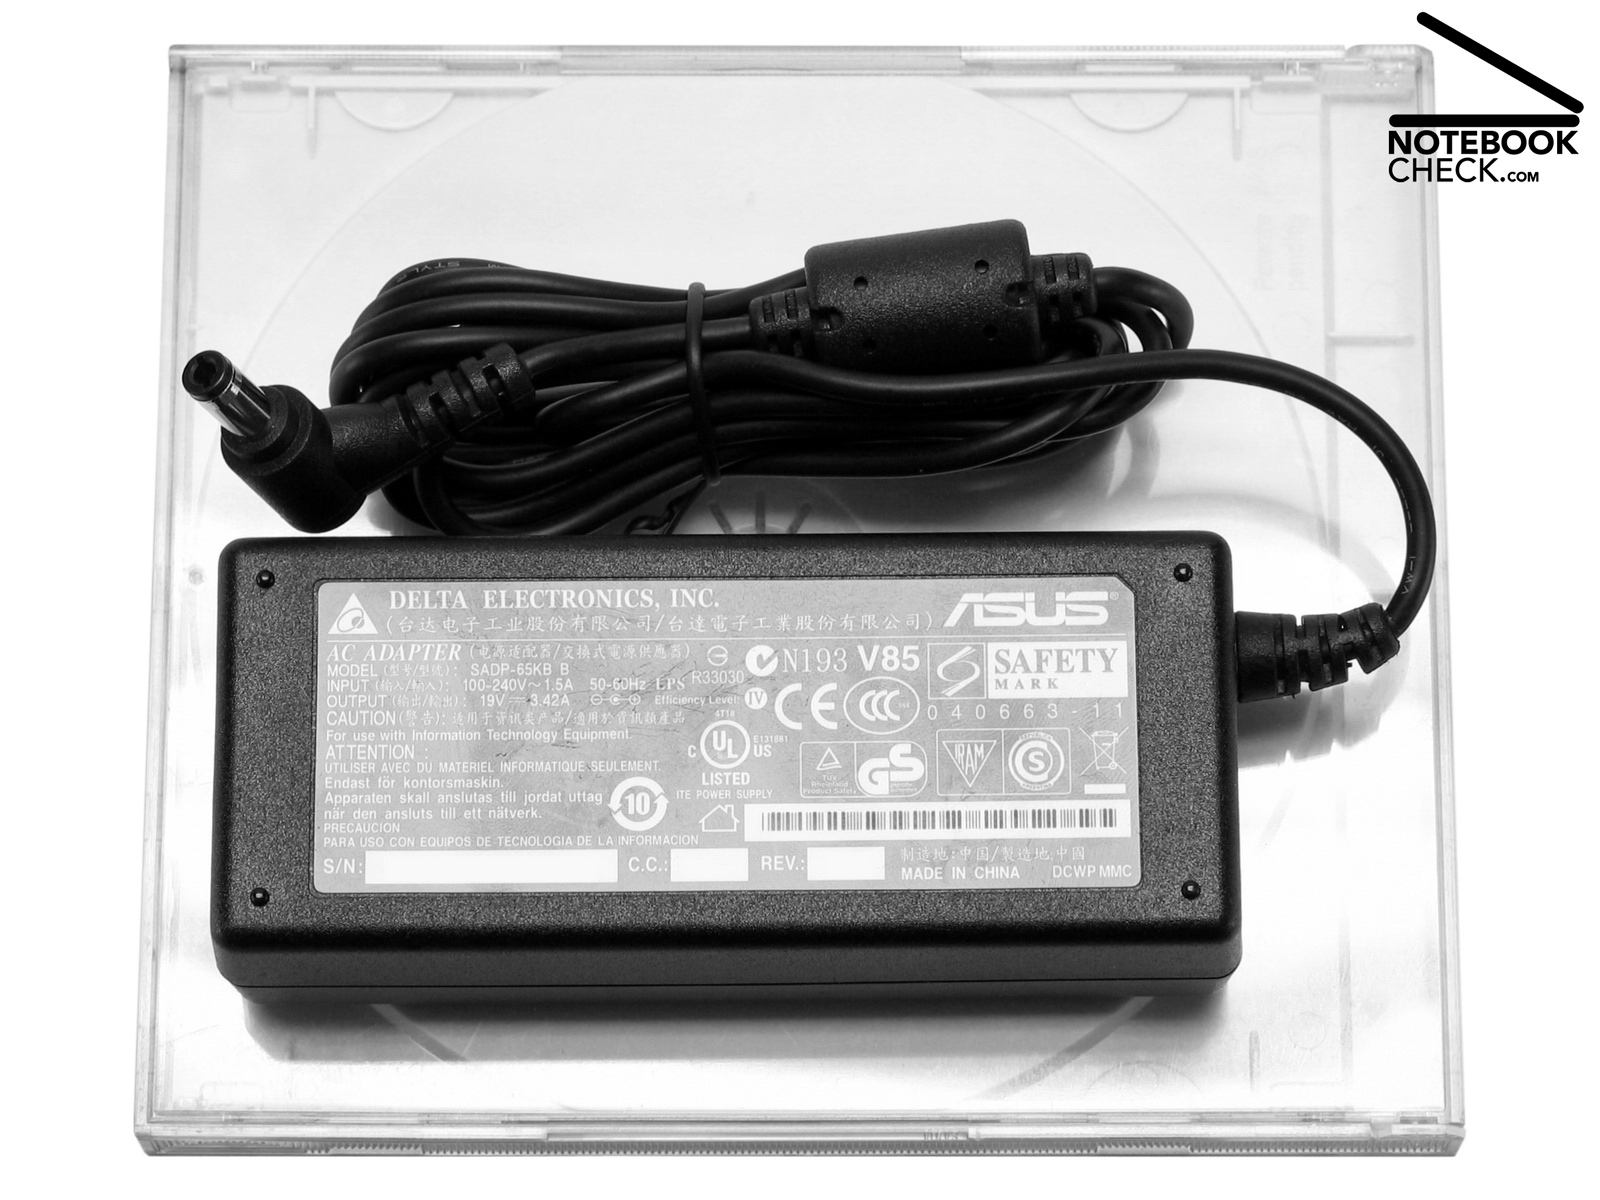 Critique De L Ultraportable Asus U2e 1p017e Notebookcheck Fr